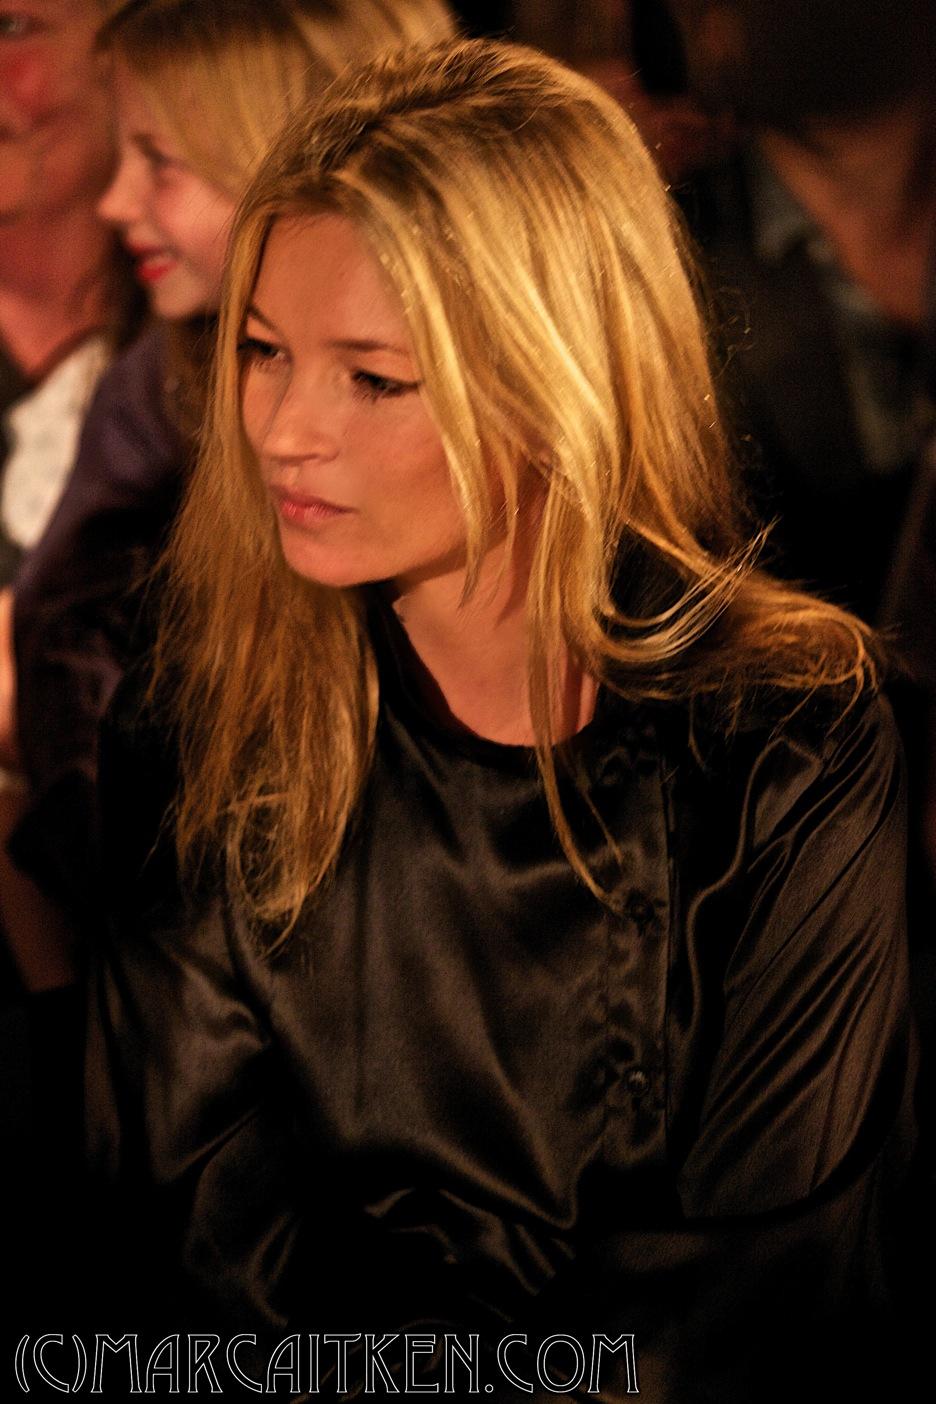 Kate Moss at London Fashion Week 2011 2.jpg